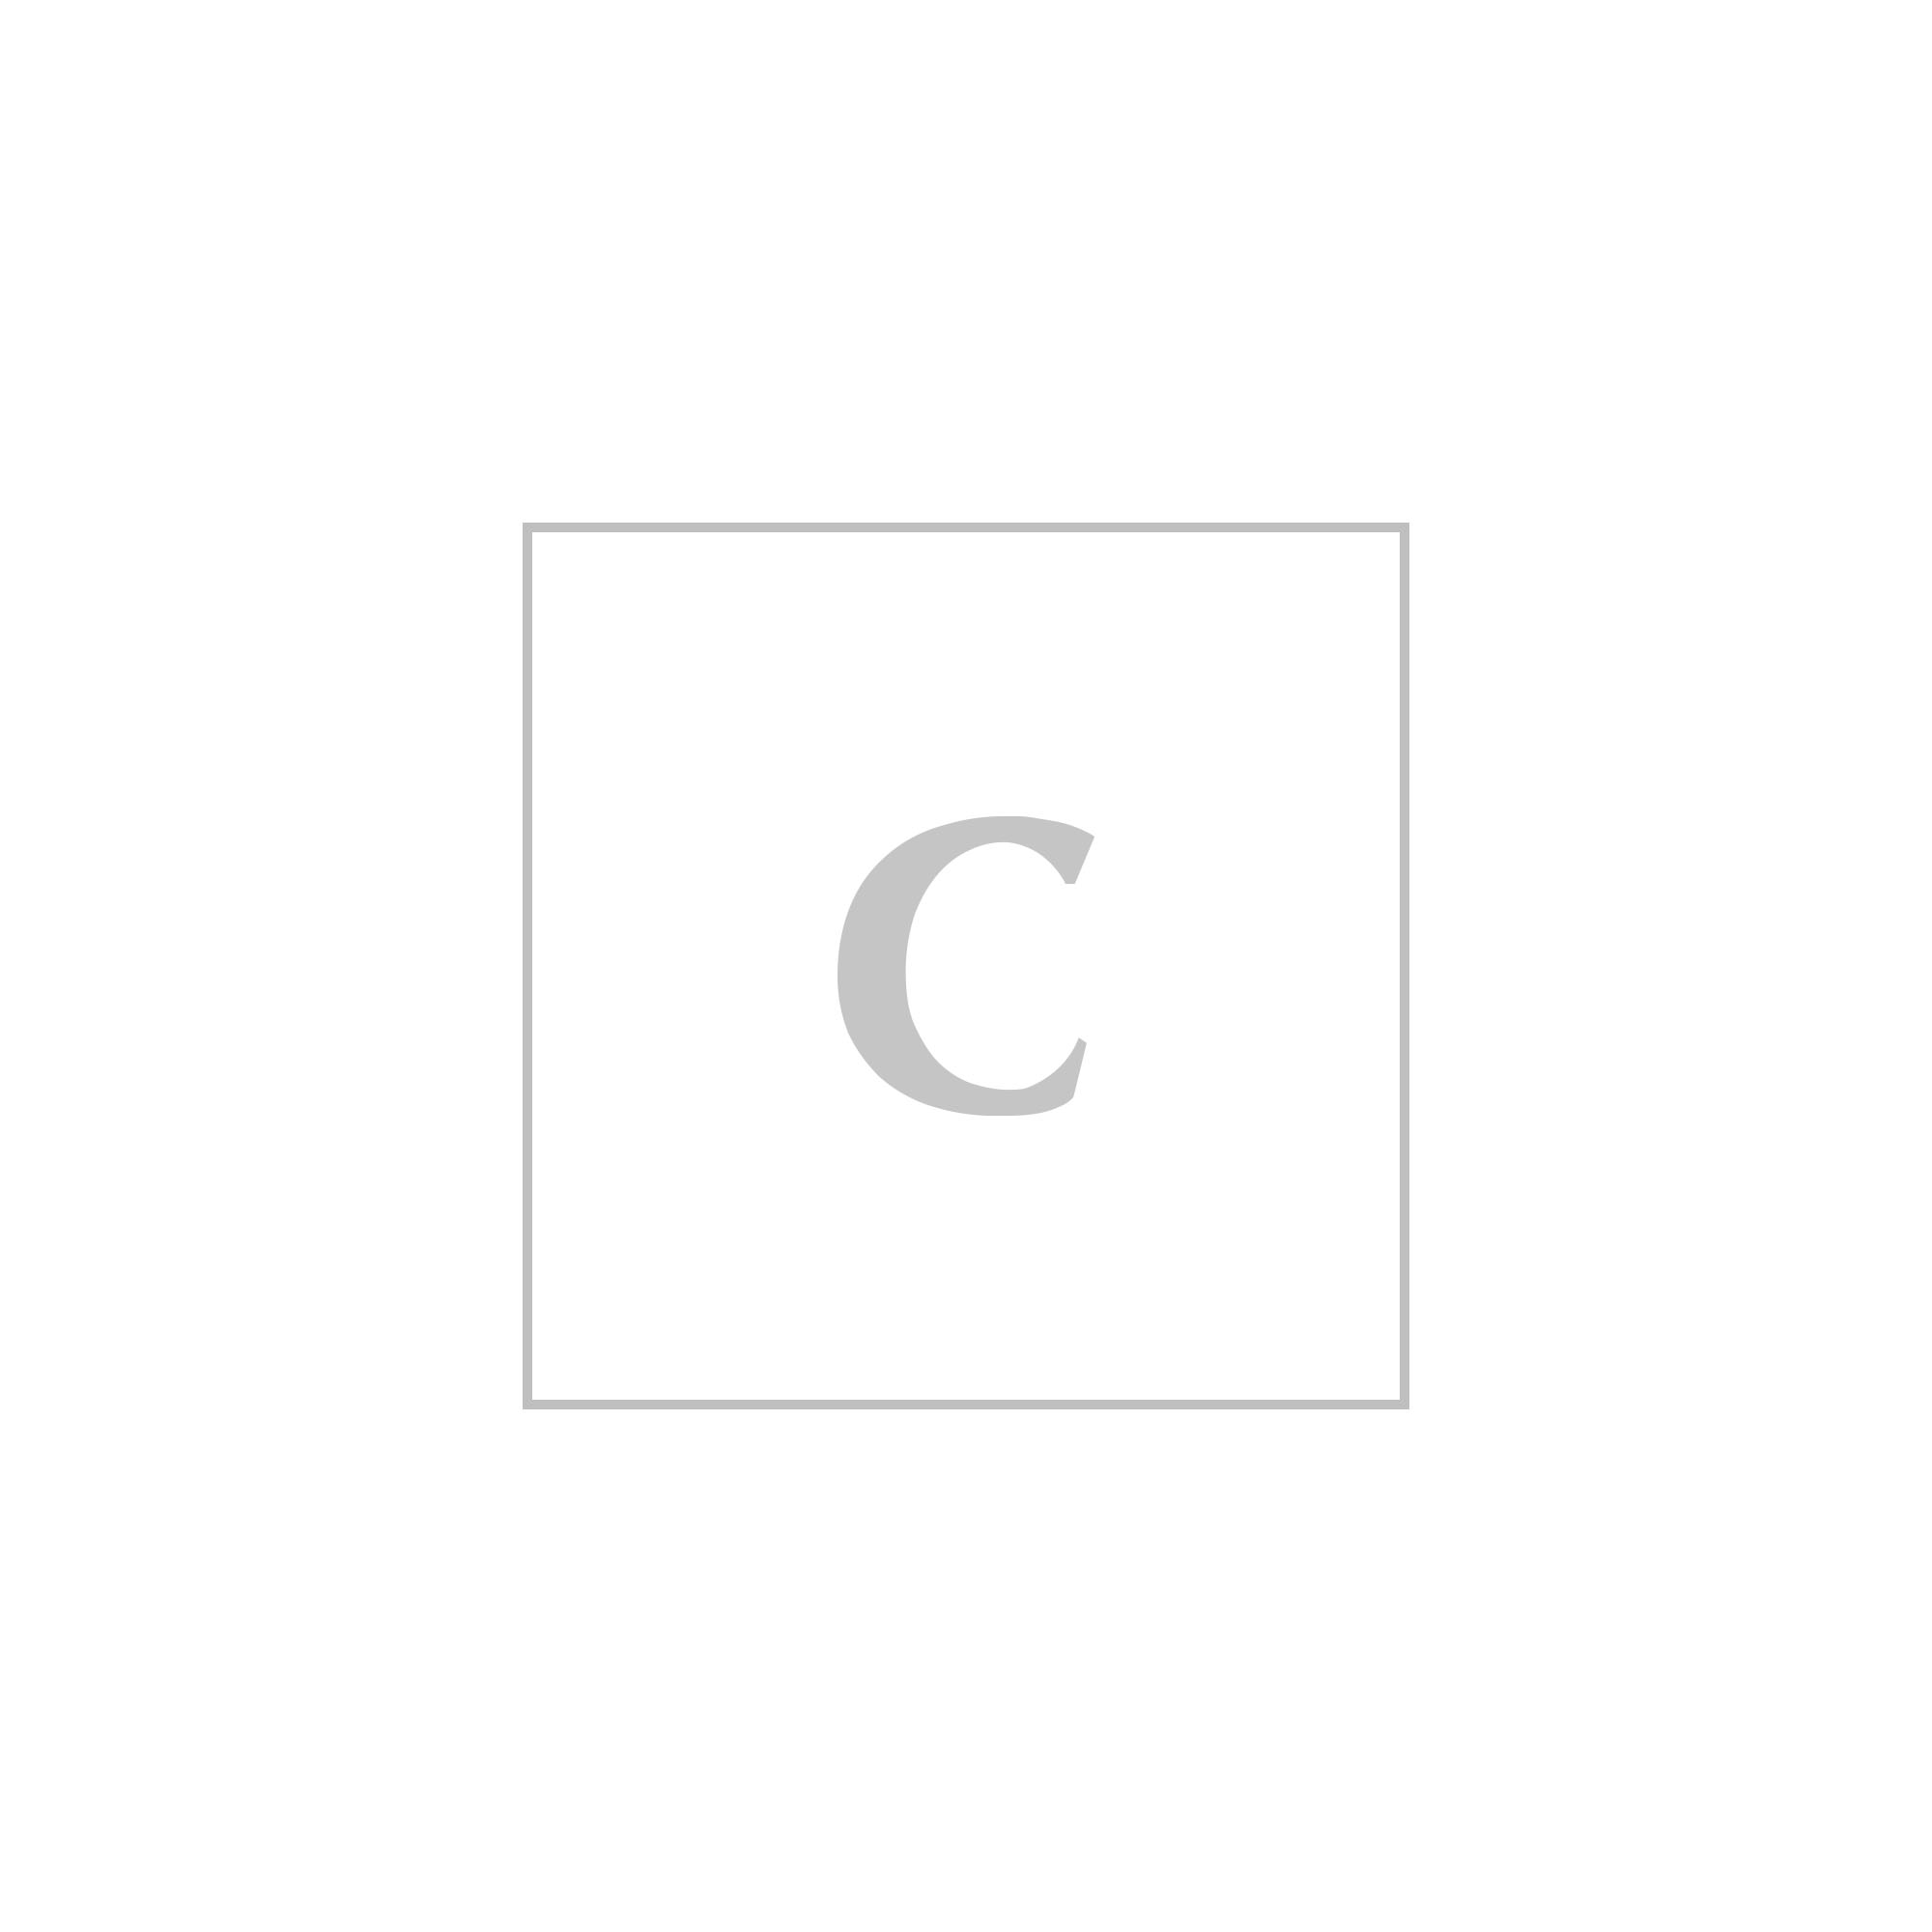 Saint laurent ysl borsa tracolla monogram